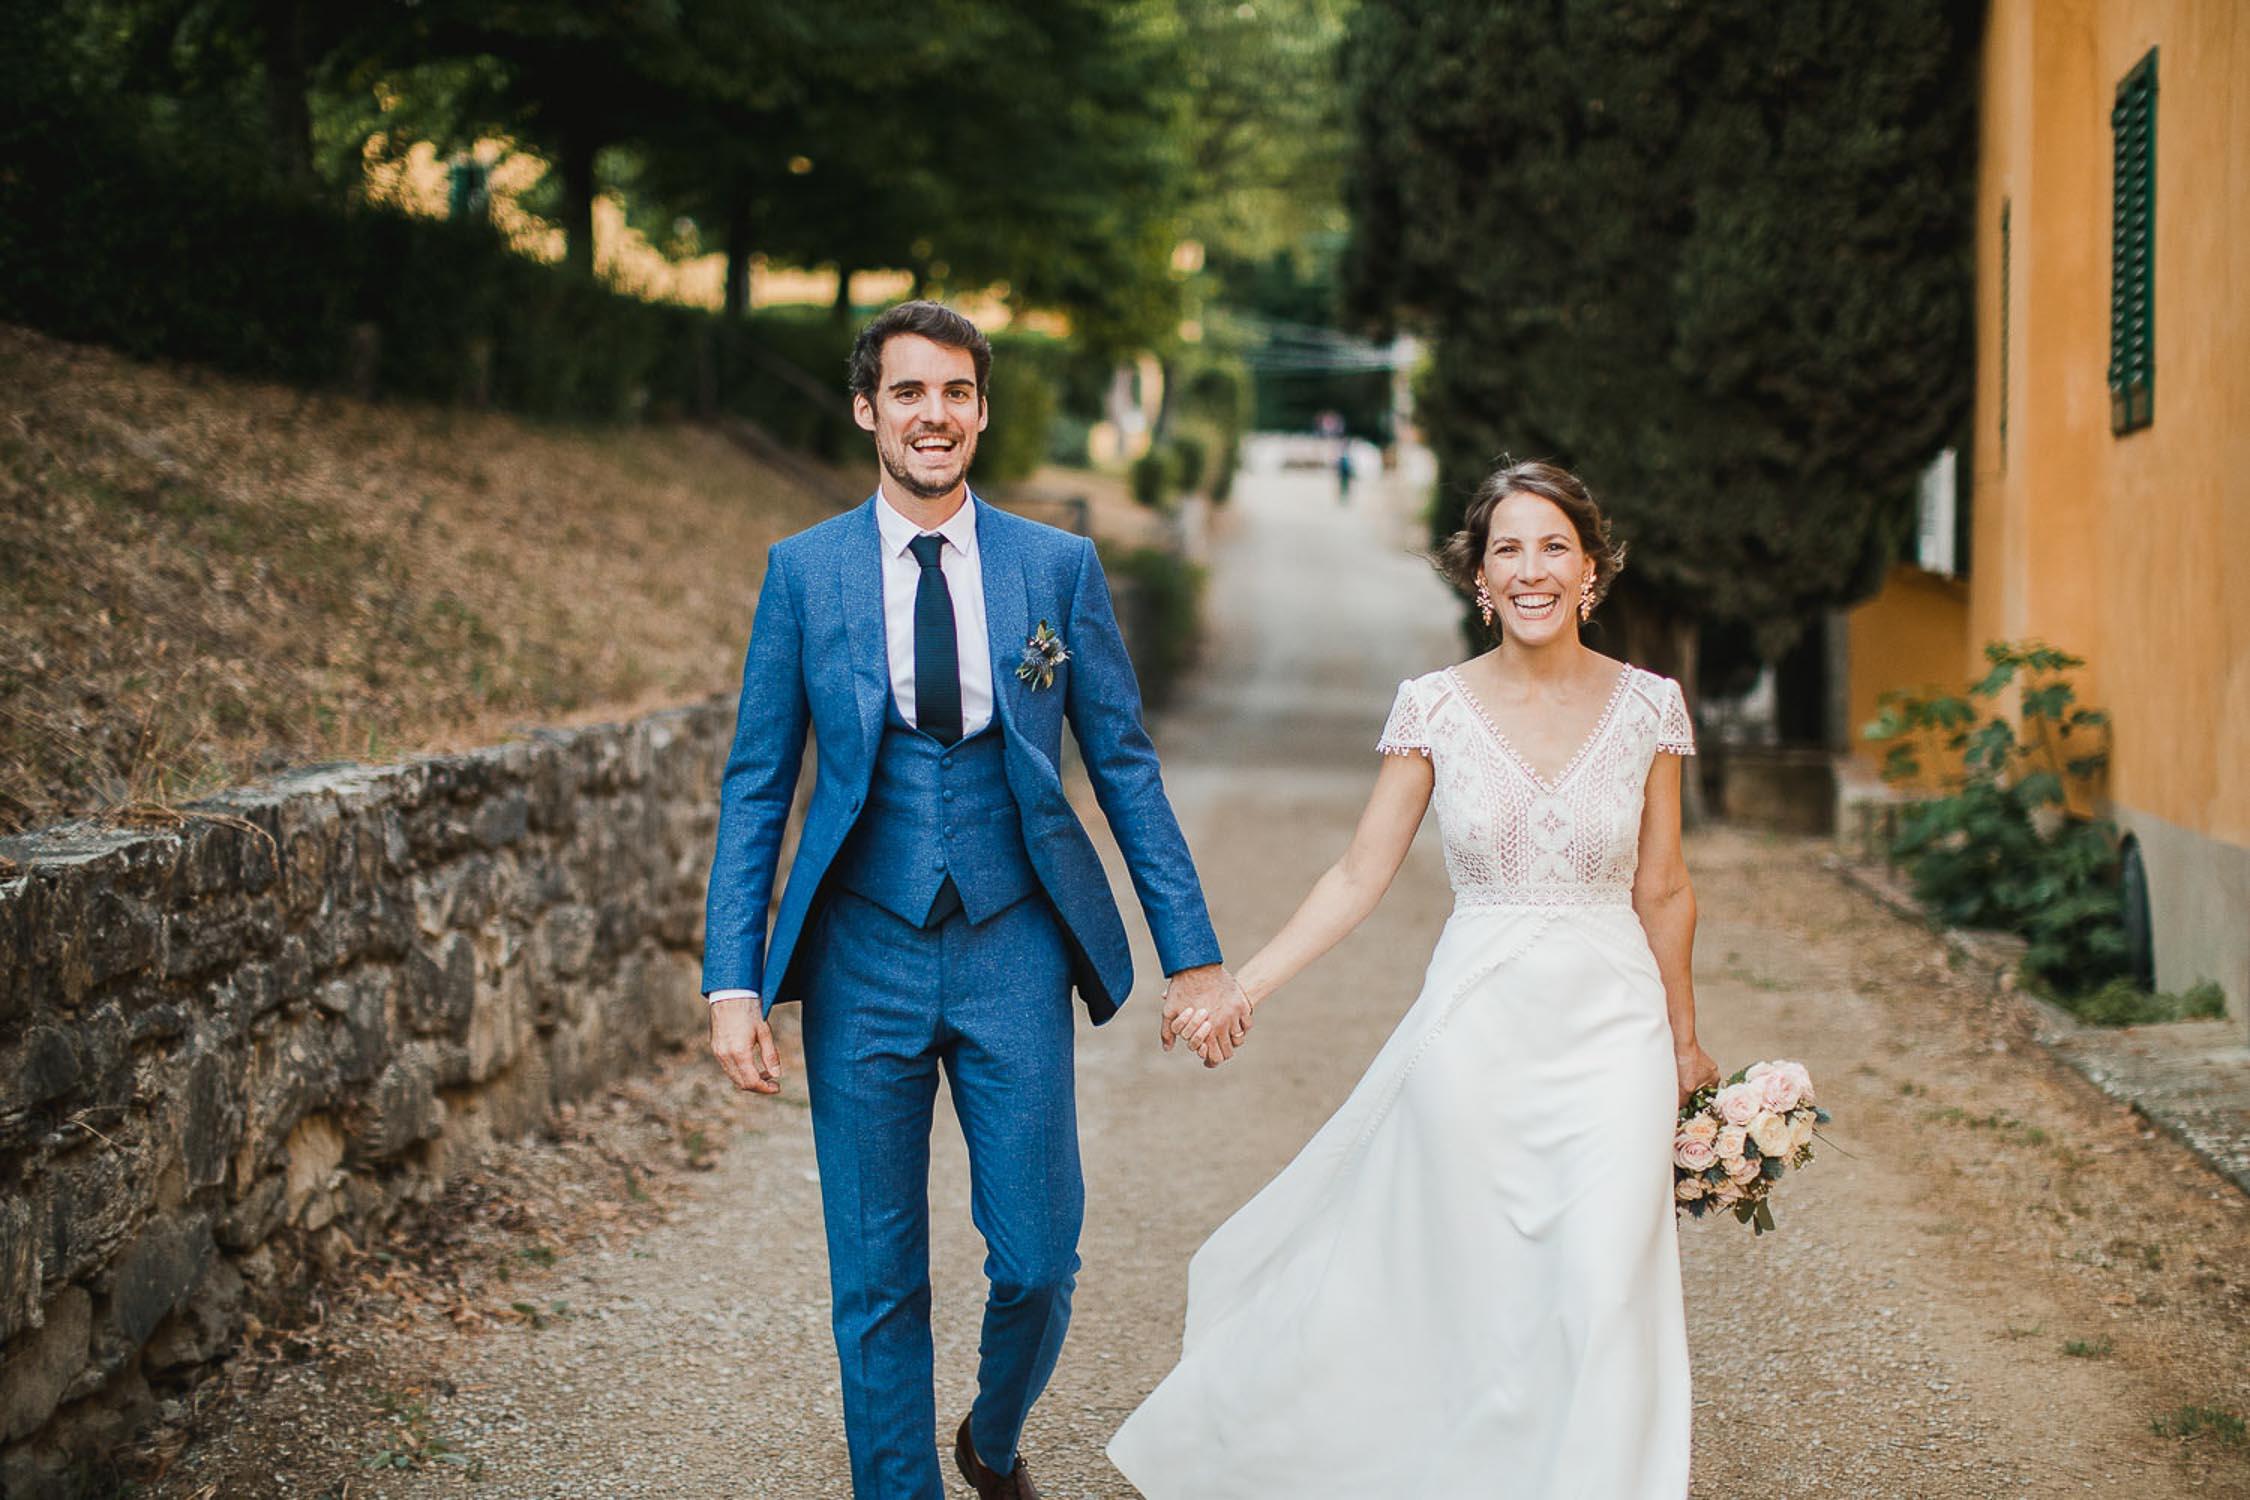 matrimonio settembre 2020 coronavirus